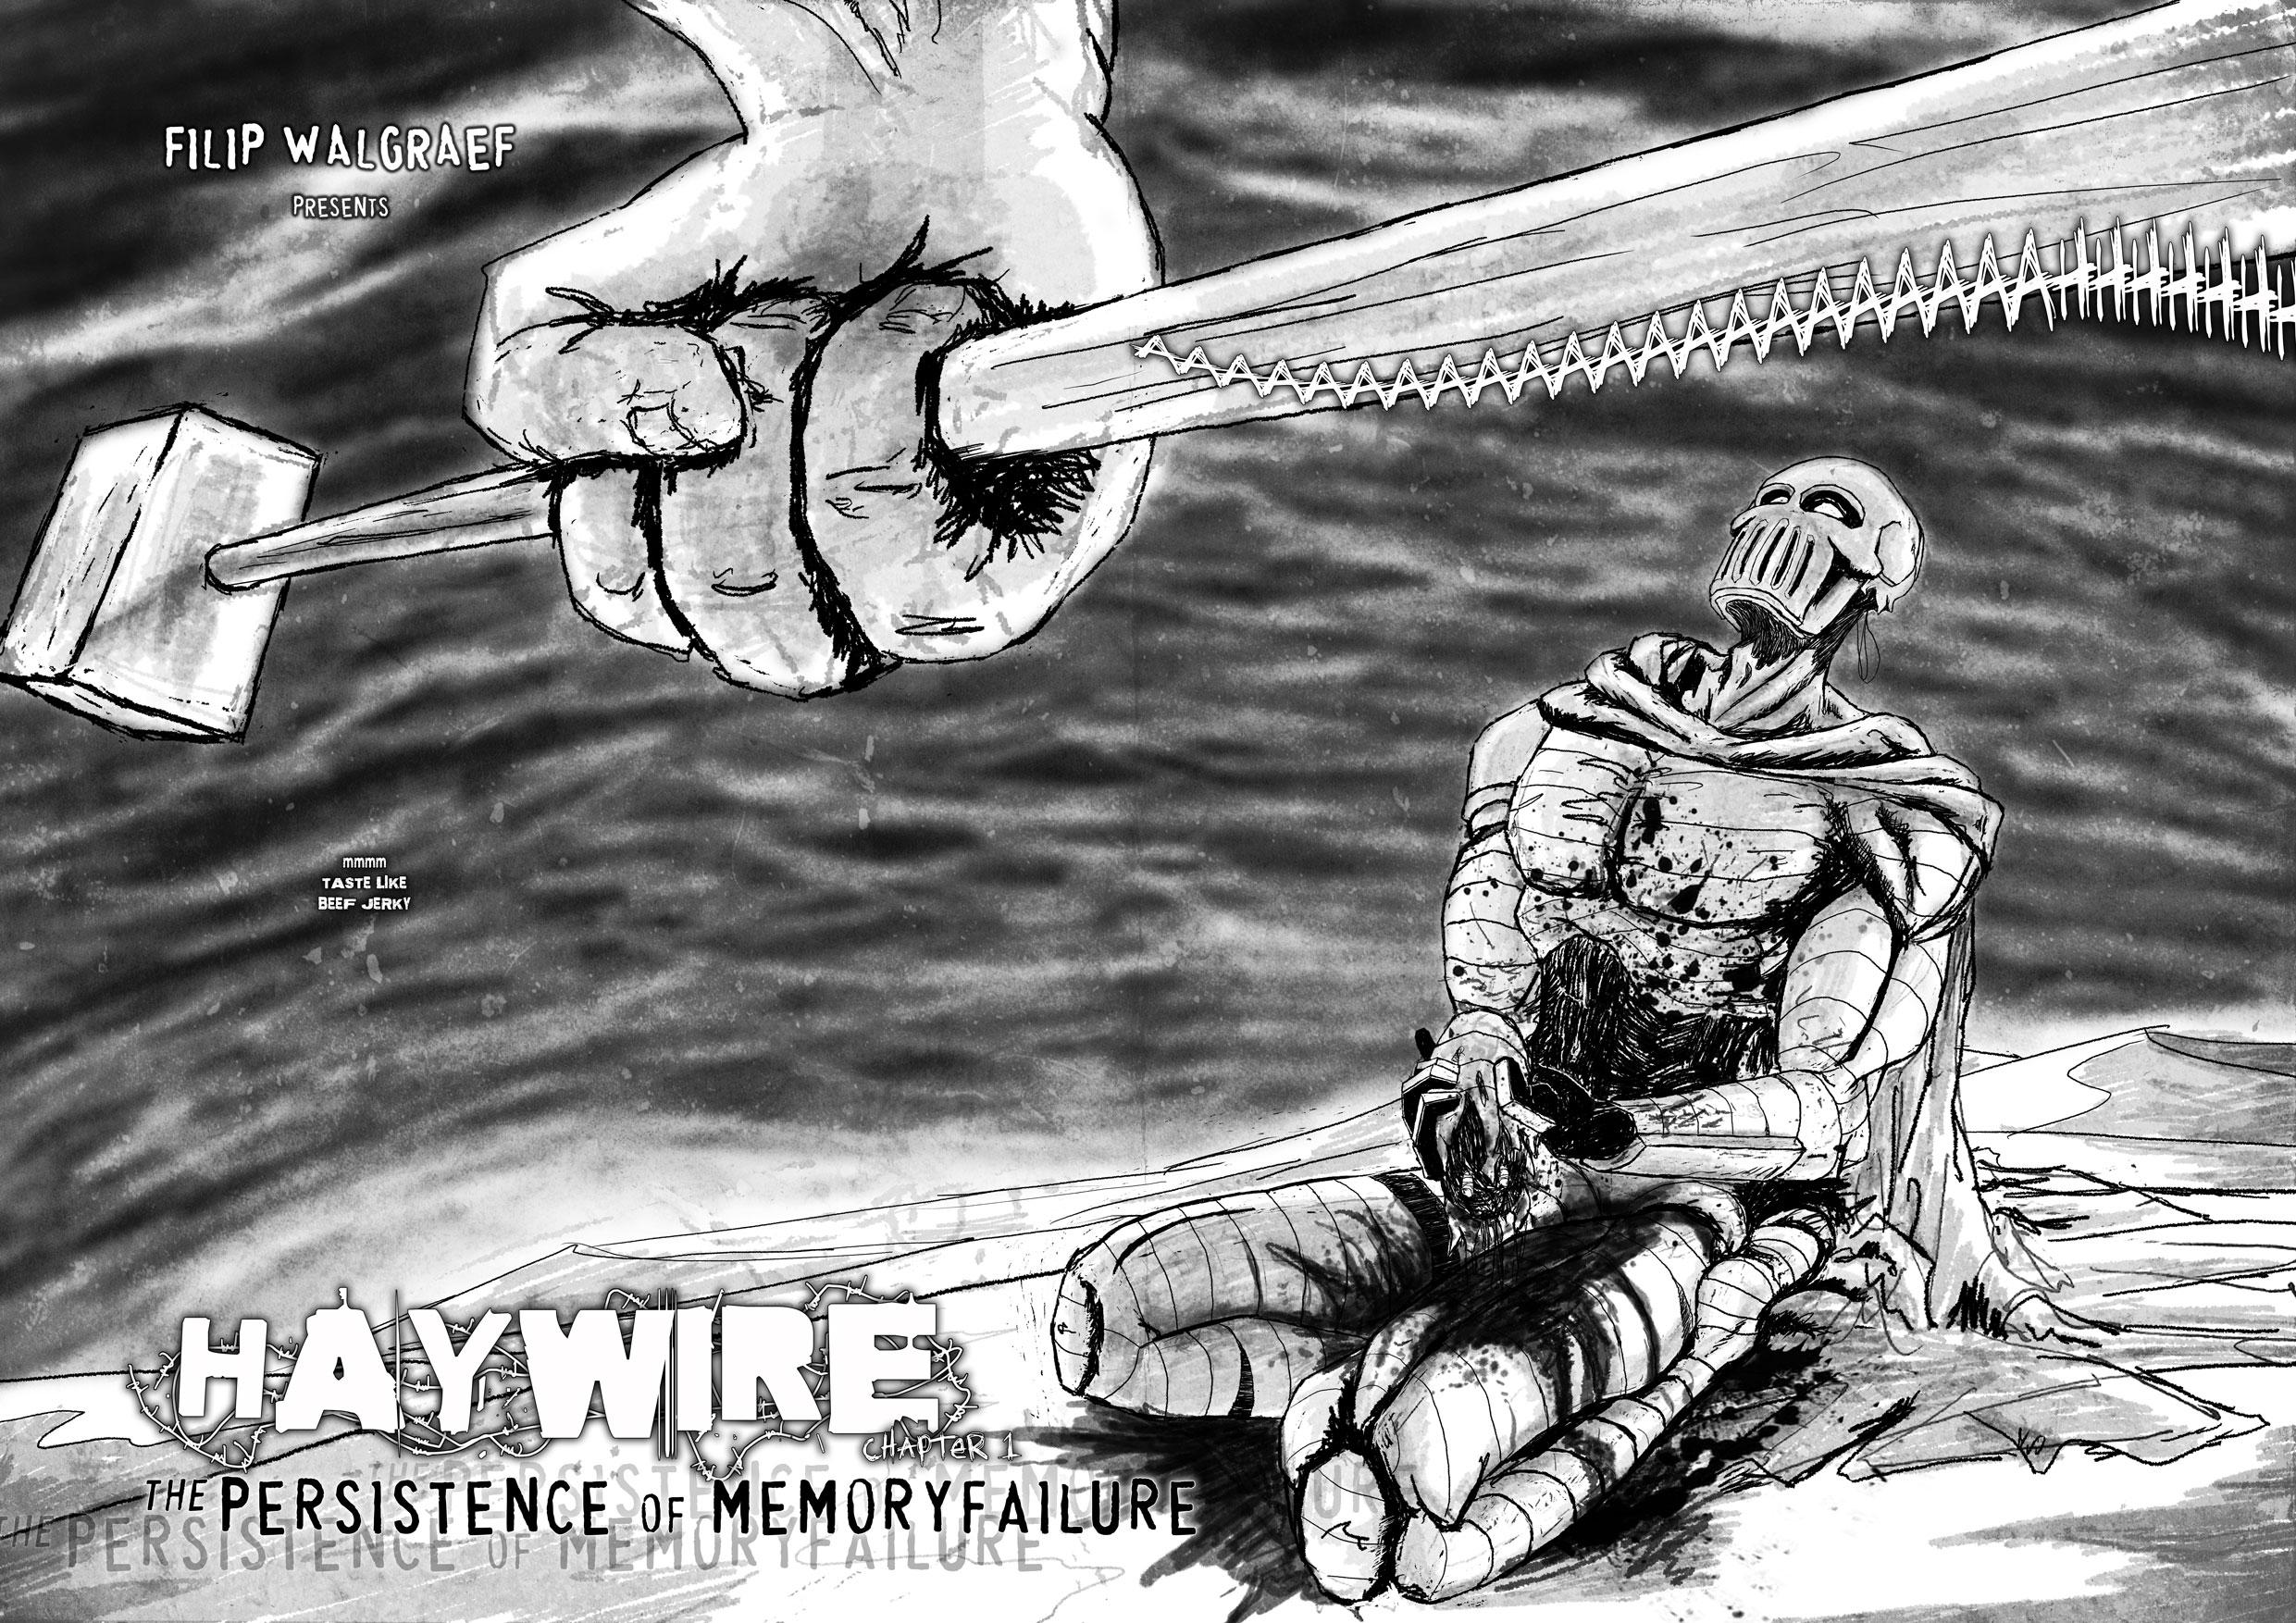 HAYWIRE 01 P22-23